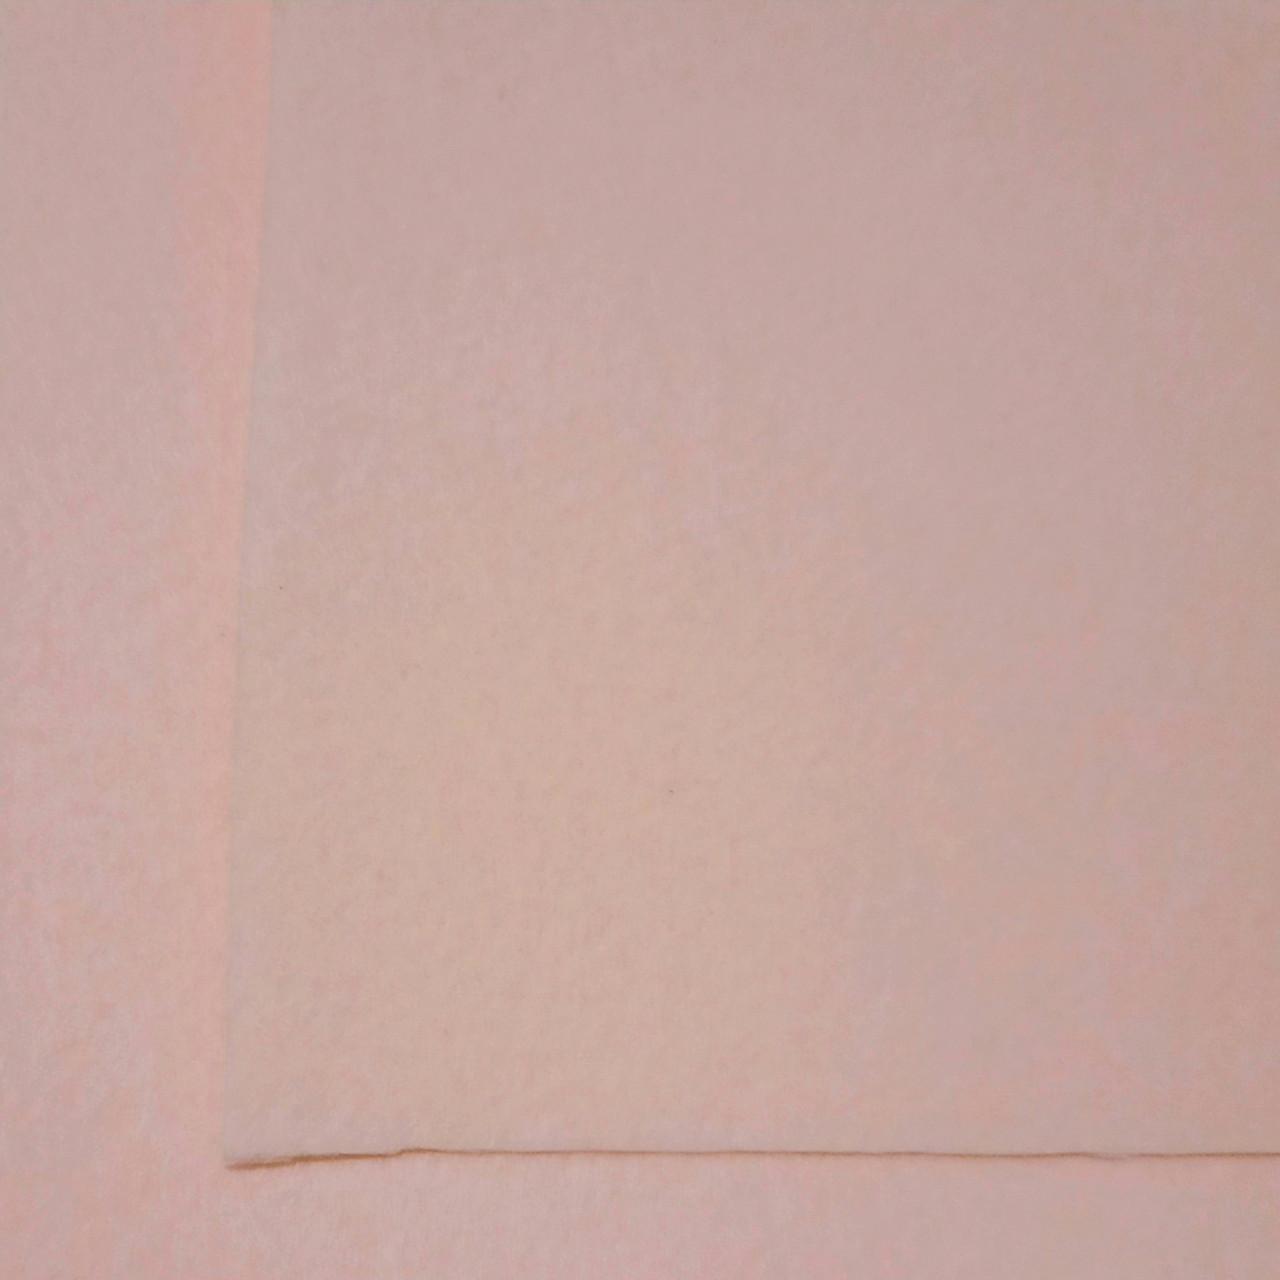 Фетр корейский жесткий 1.2 мм, 20 на 30 см ПУДРОВЫЙ